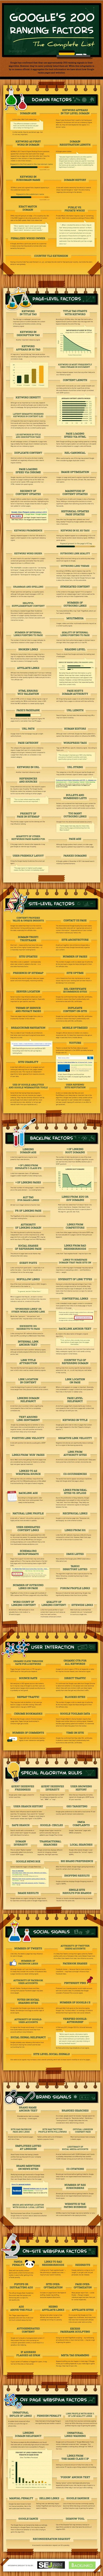 200 faktor penentu sebuah website merangking di Google